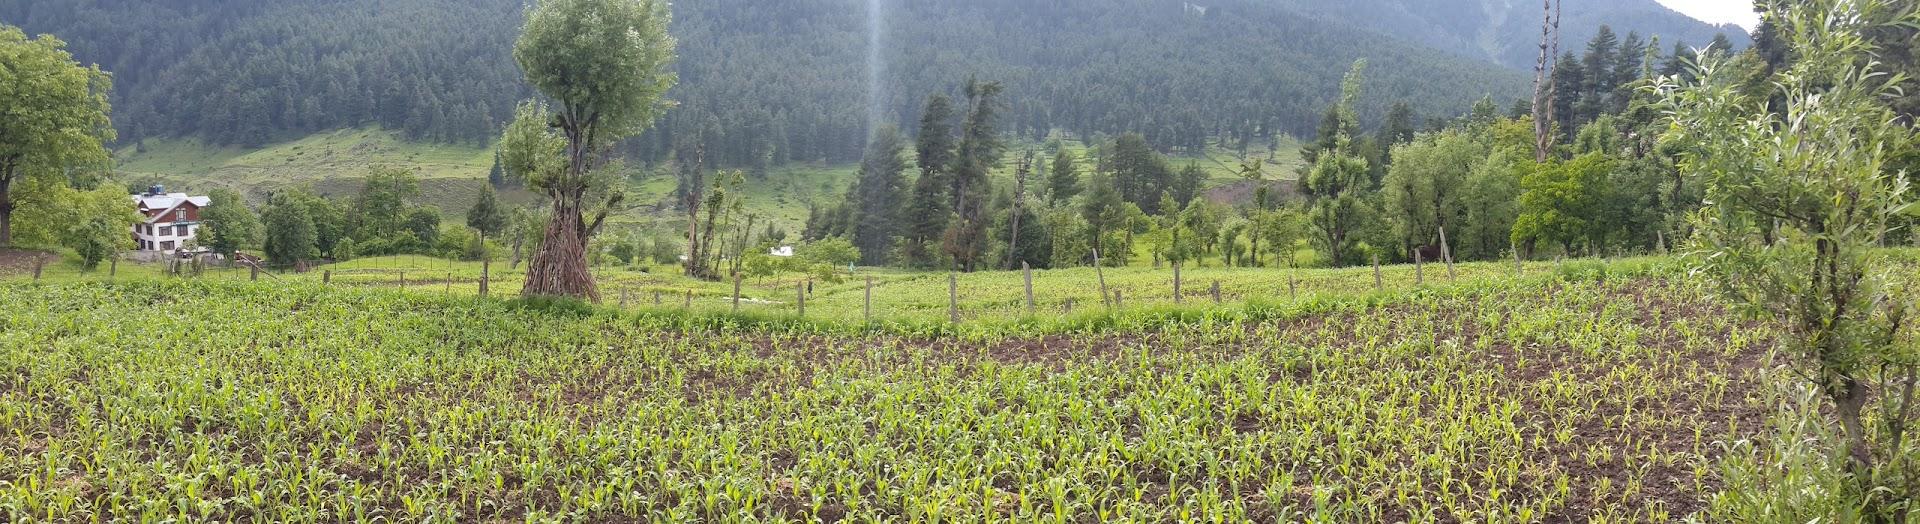 Panaroma shot of a farm